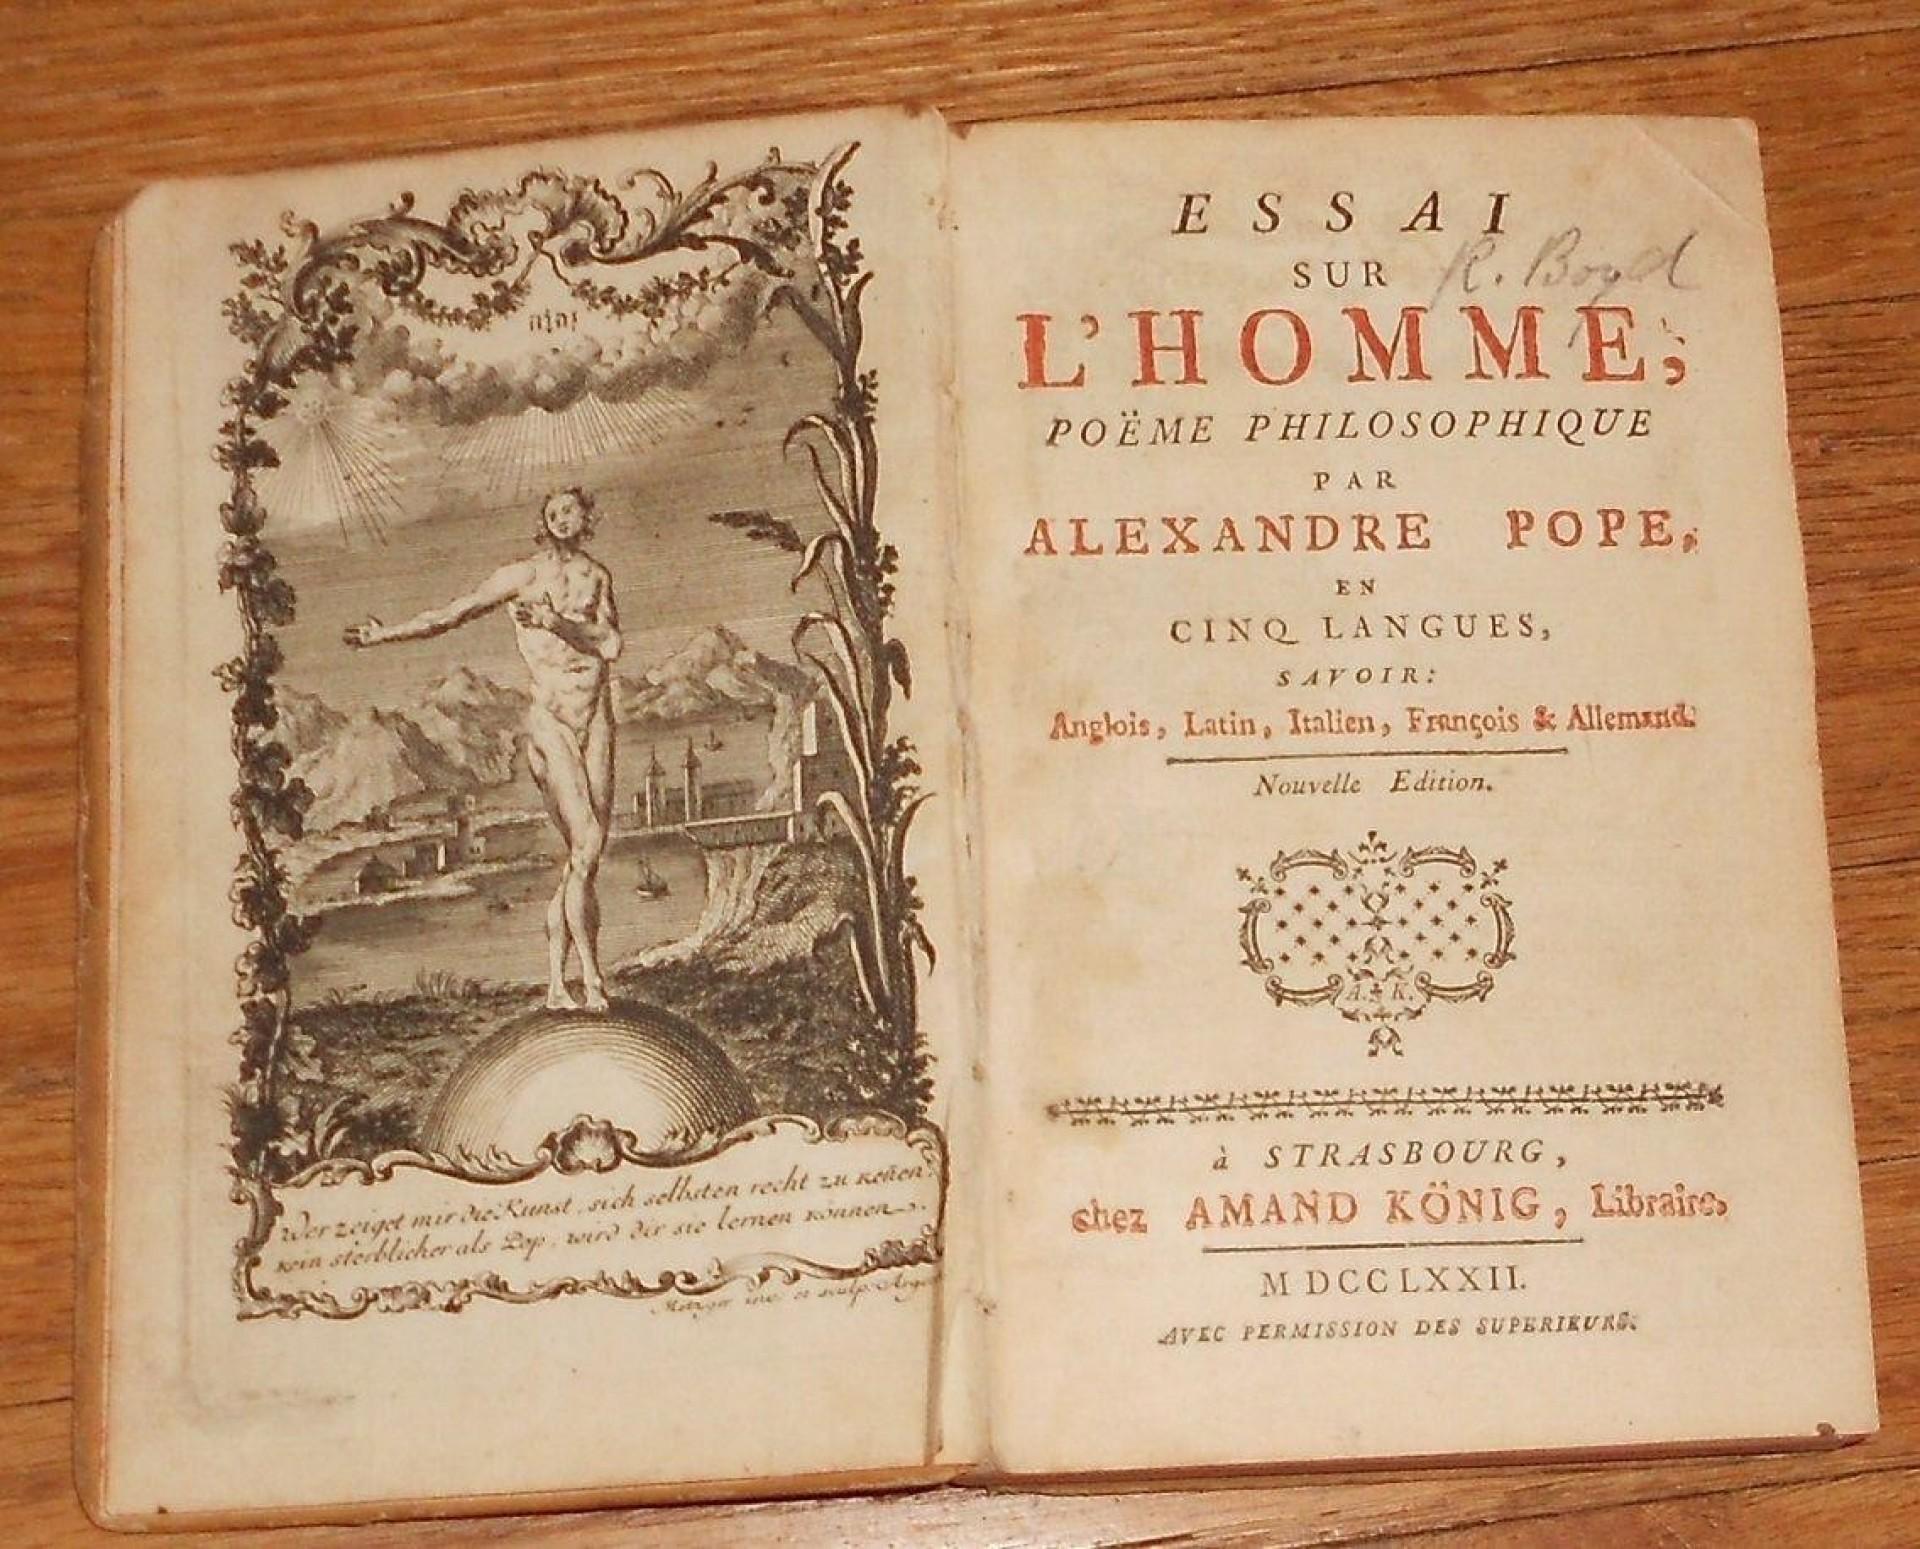 015 Alexander Pope Essay On Man Antique Book 1 1dc4fdaeab67e1326b1644bdae9f9884 Dreaded Summary Epistle 2 Pdf 1920